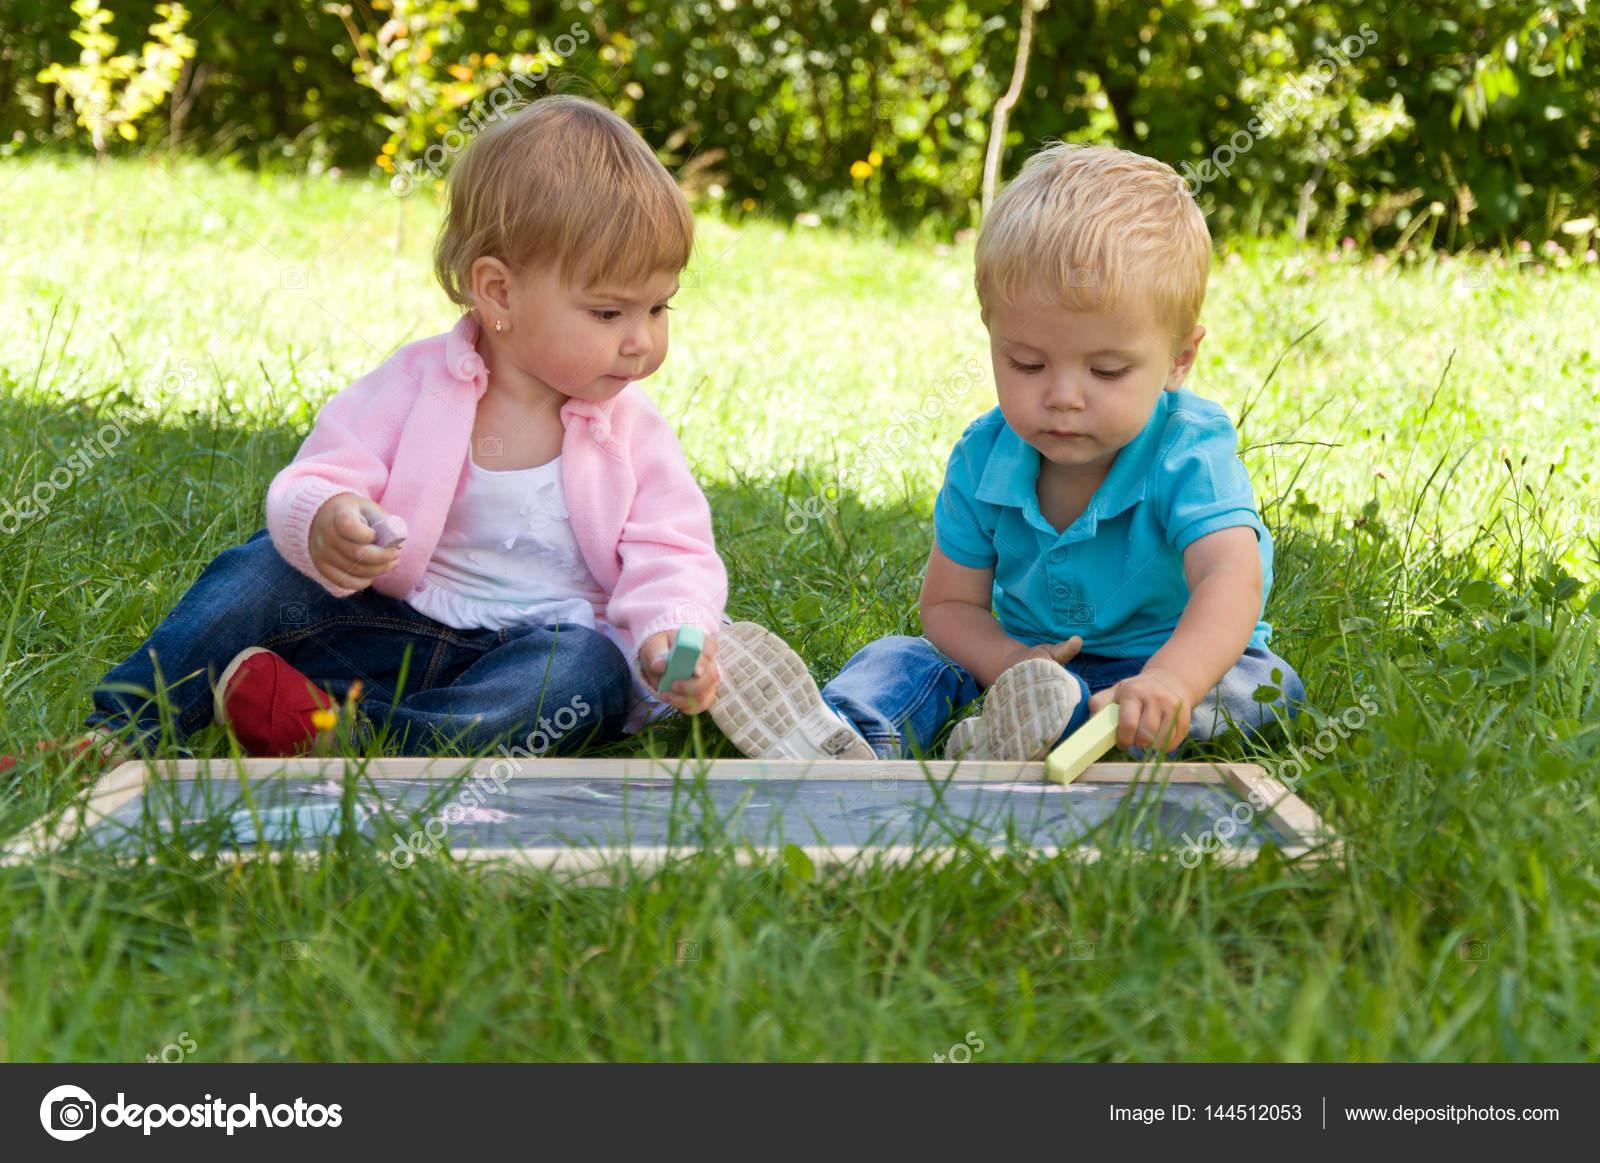 5bbf631999c κορίτσι και αγόρι. μικρά παιδιά περνούν ώρα στη φύση — Φωτογραφία ...